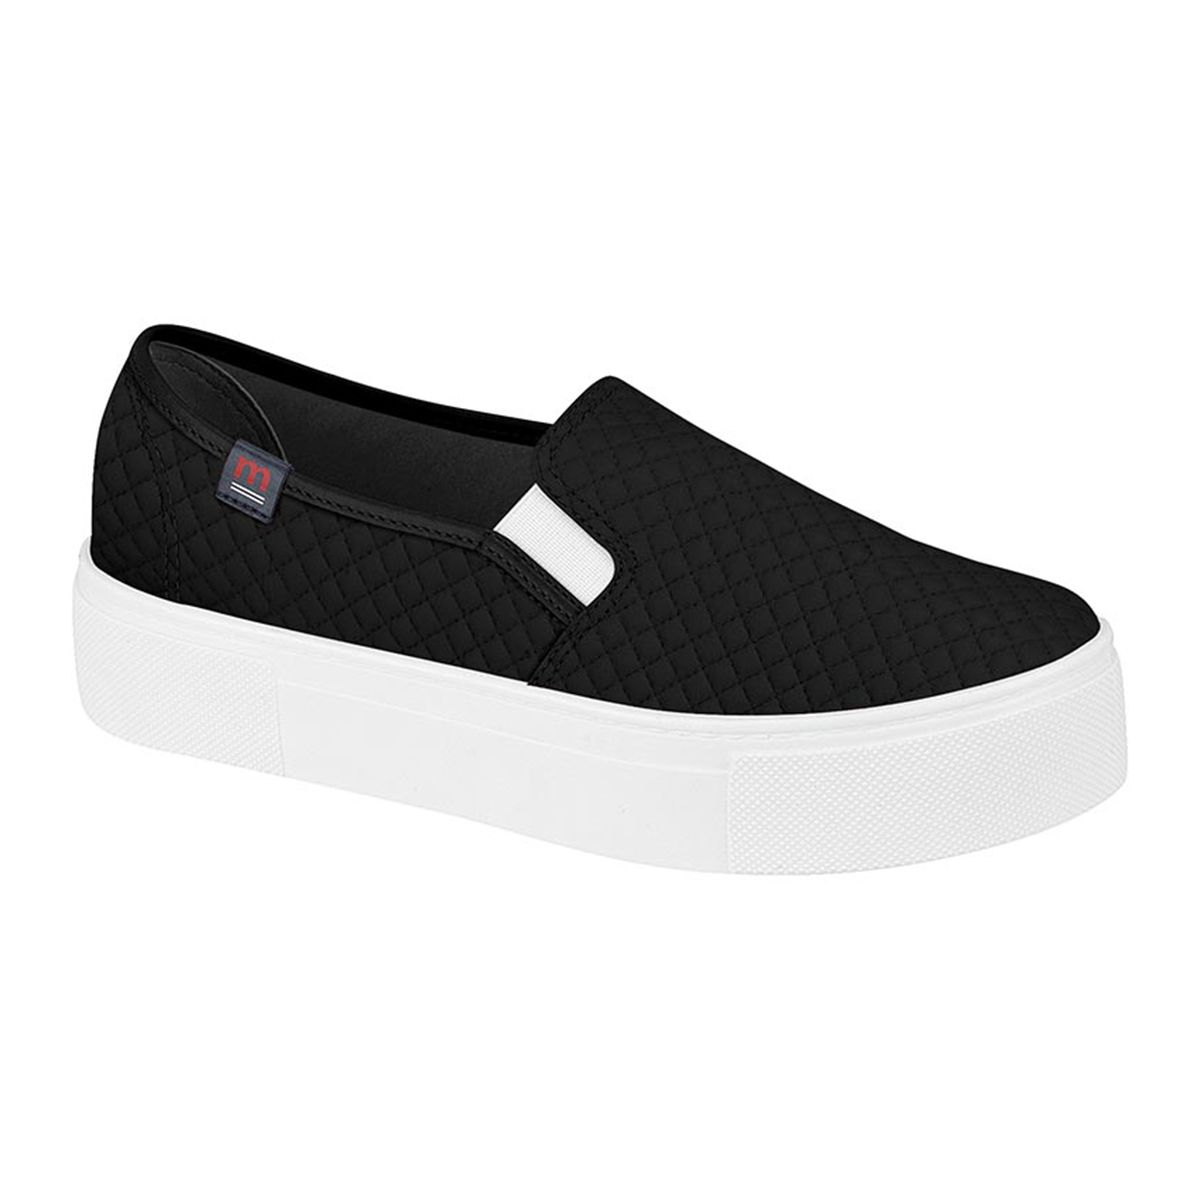 Tênis Feminino Sneakers Moleca 5658.100